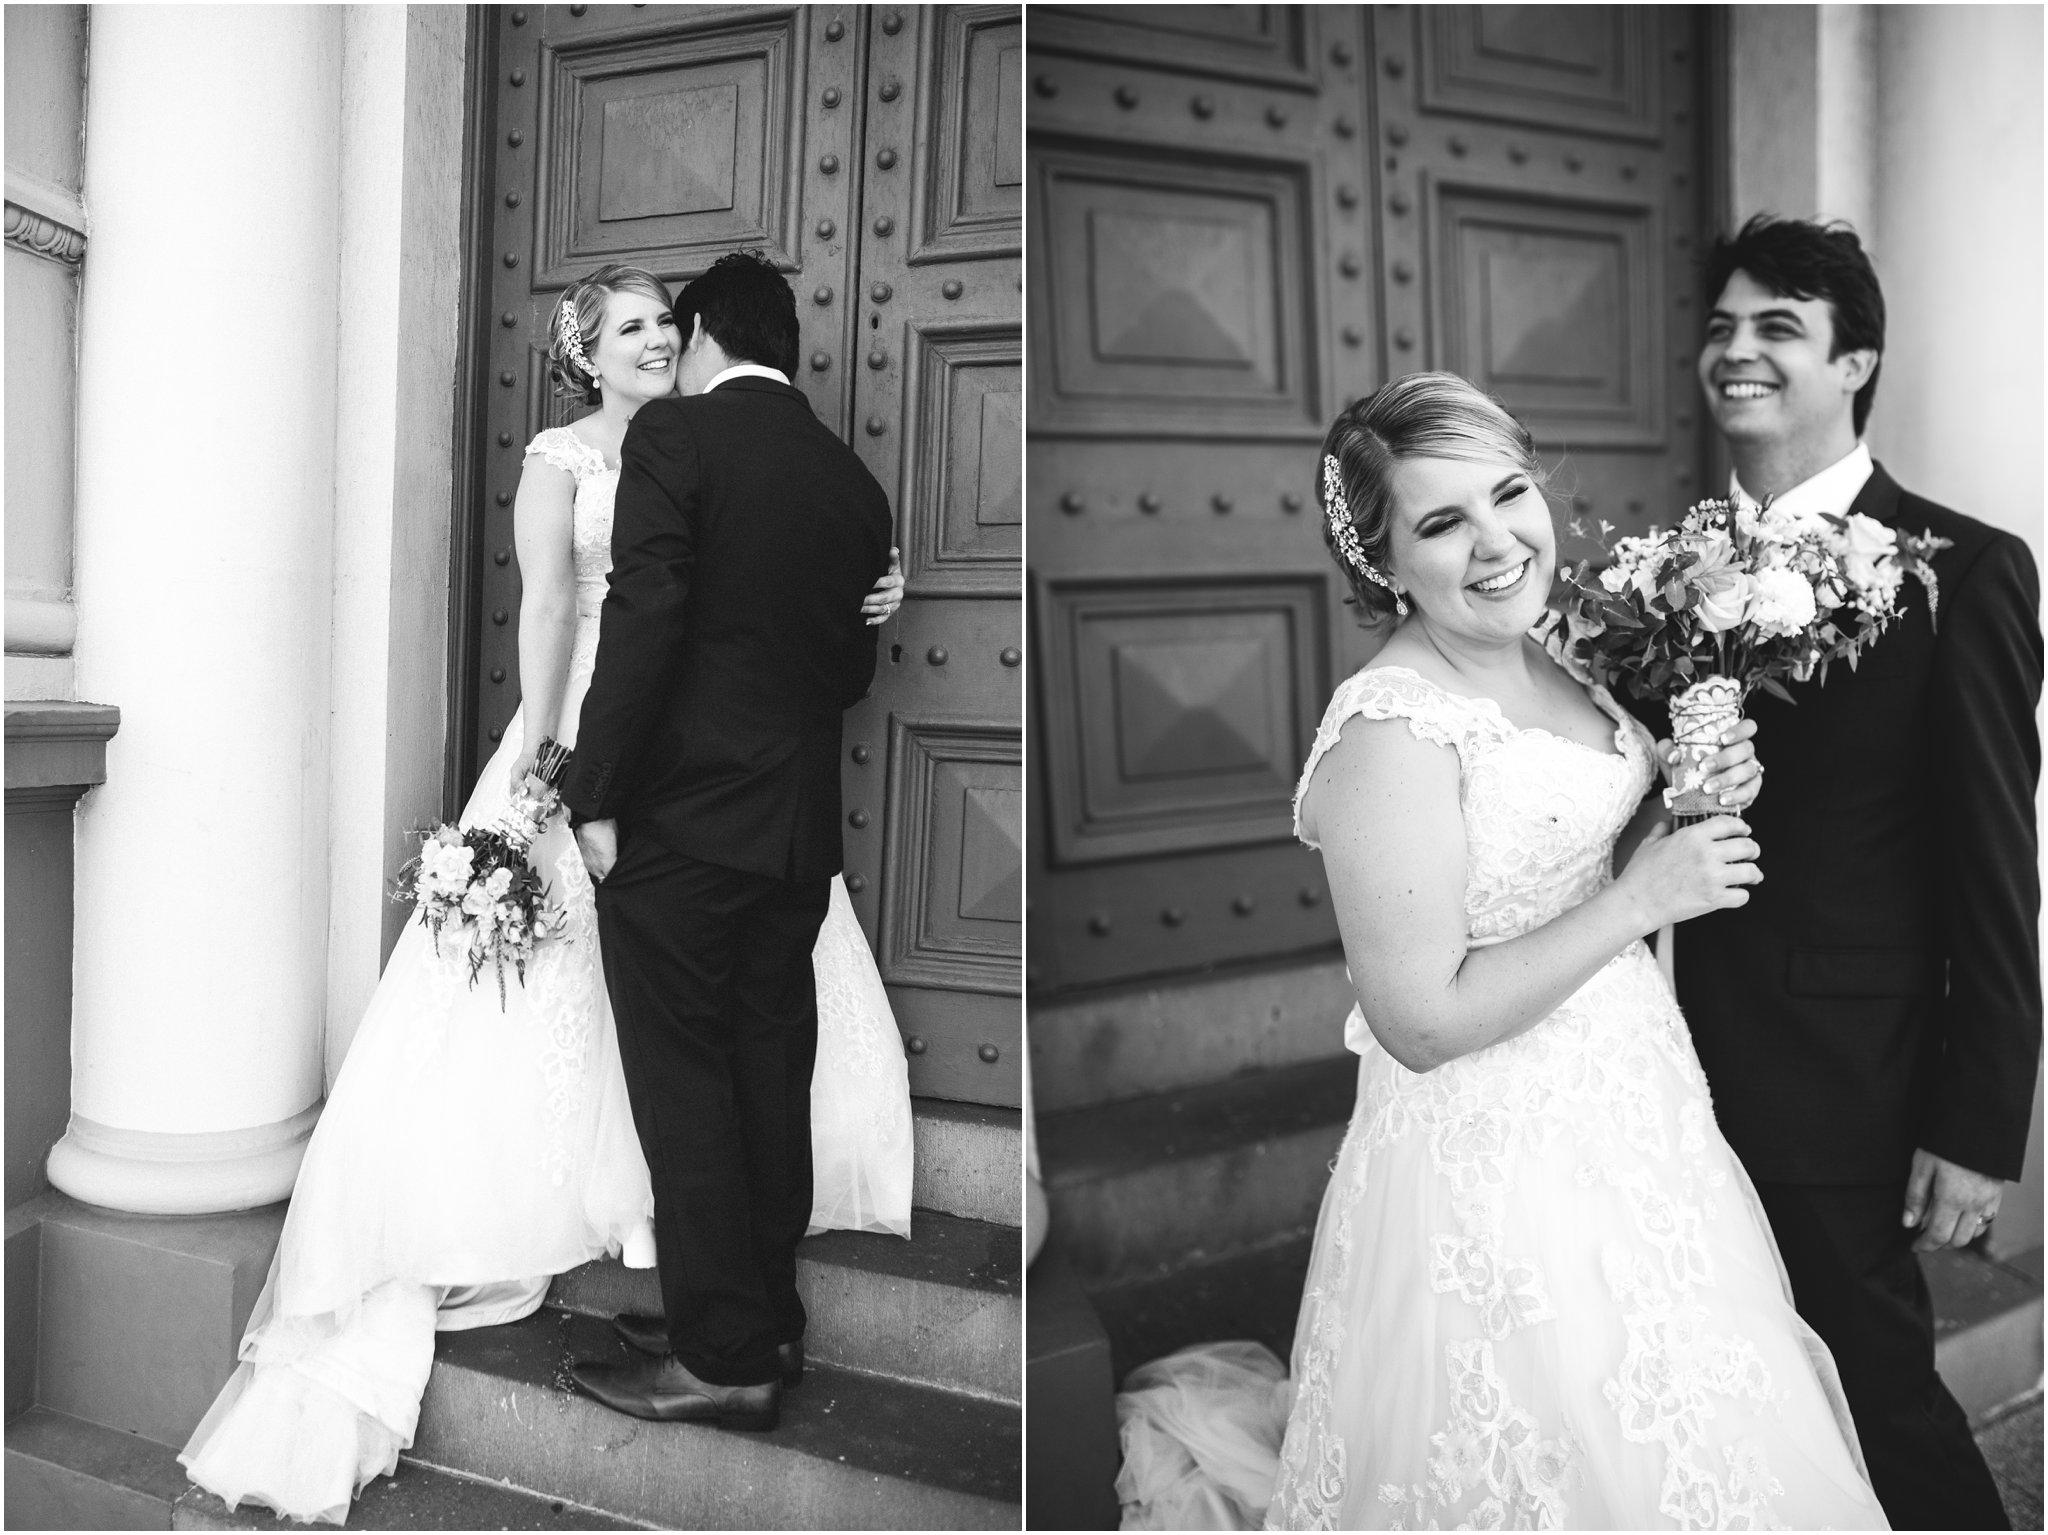 fremantle-wedding-photograhy-liz-jorquera.jpg